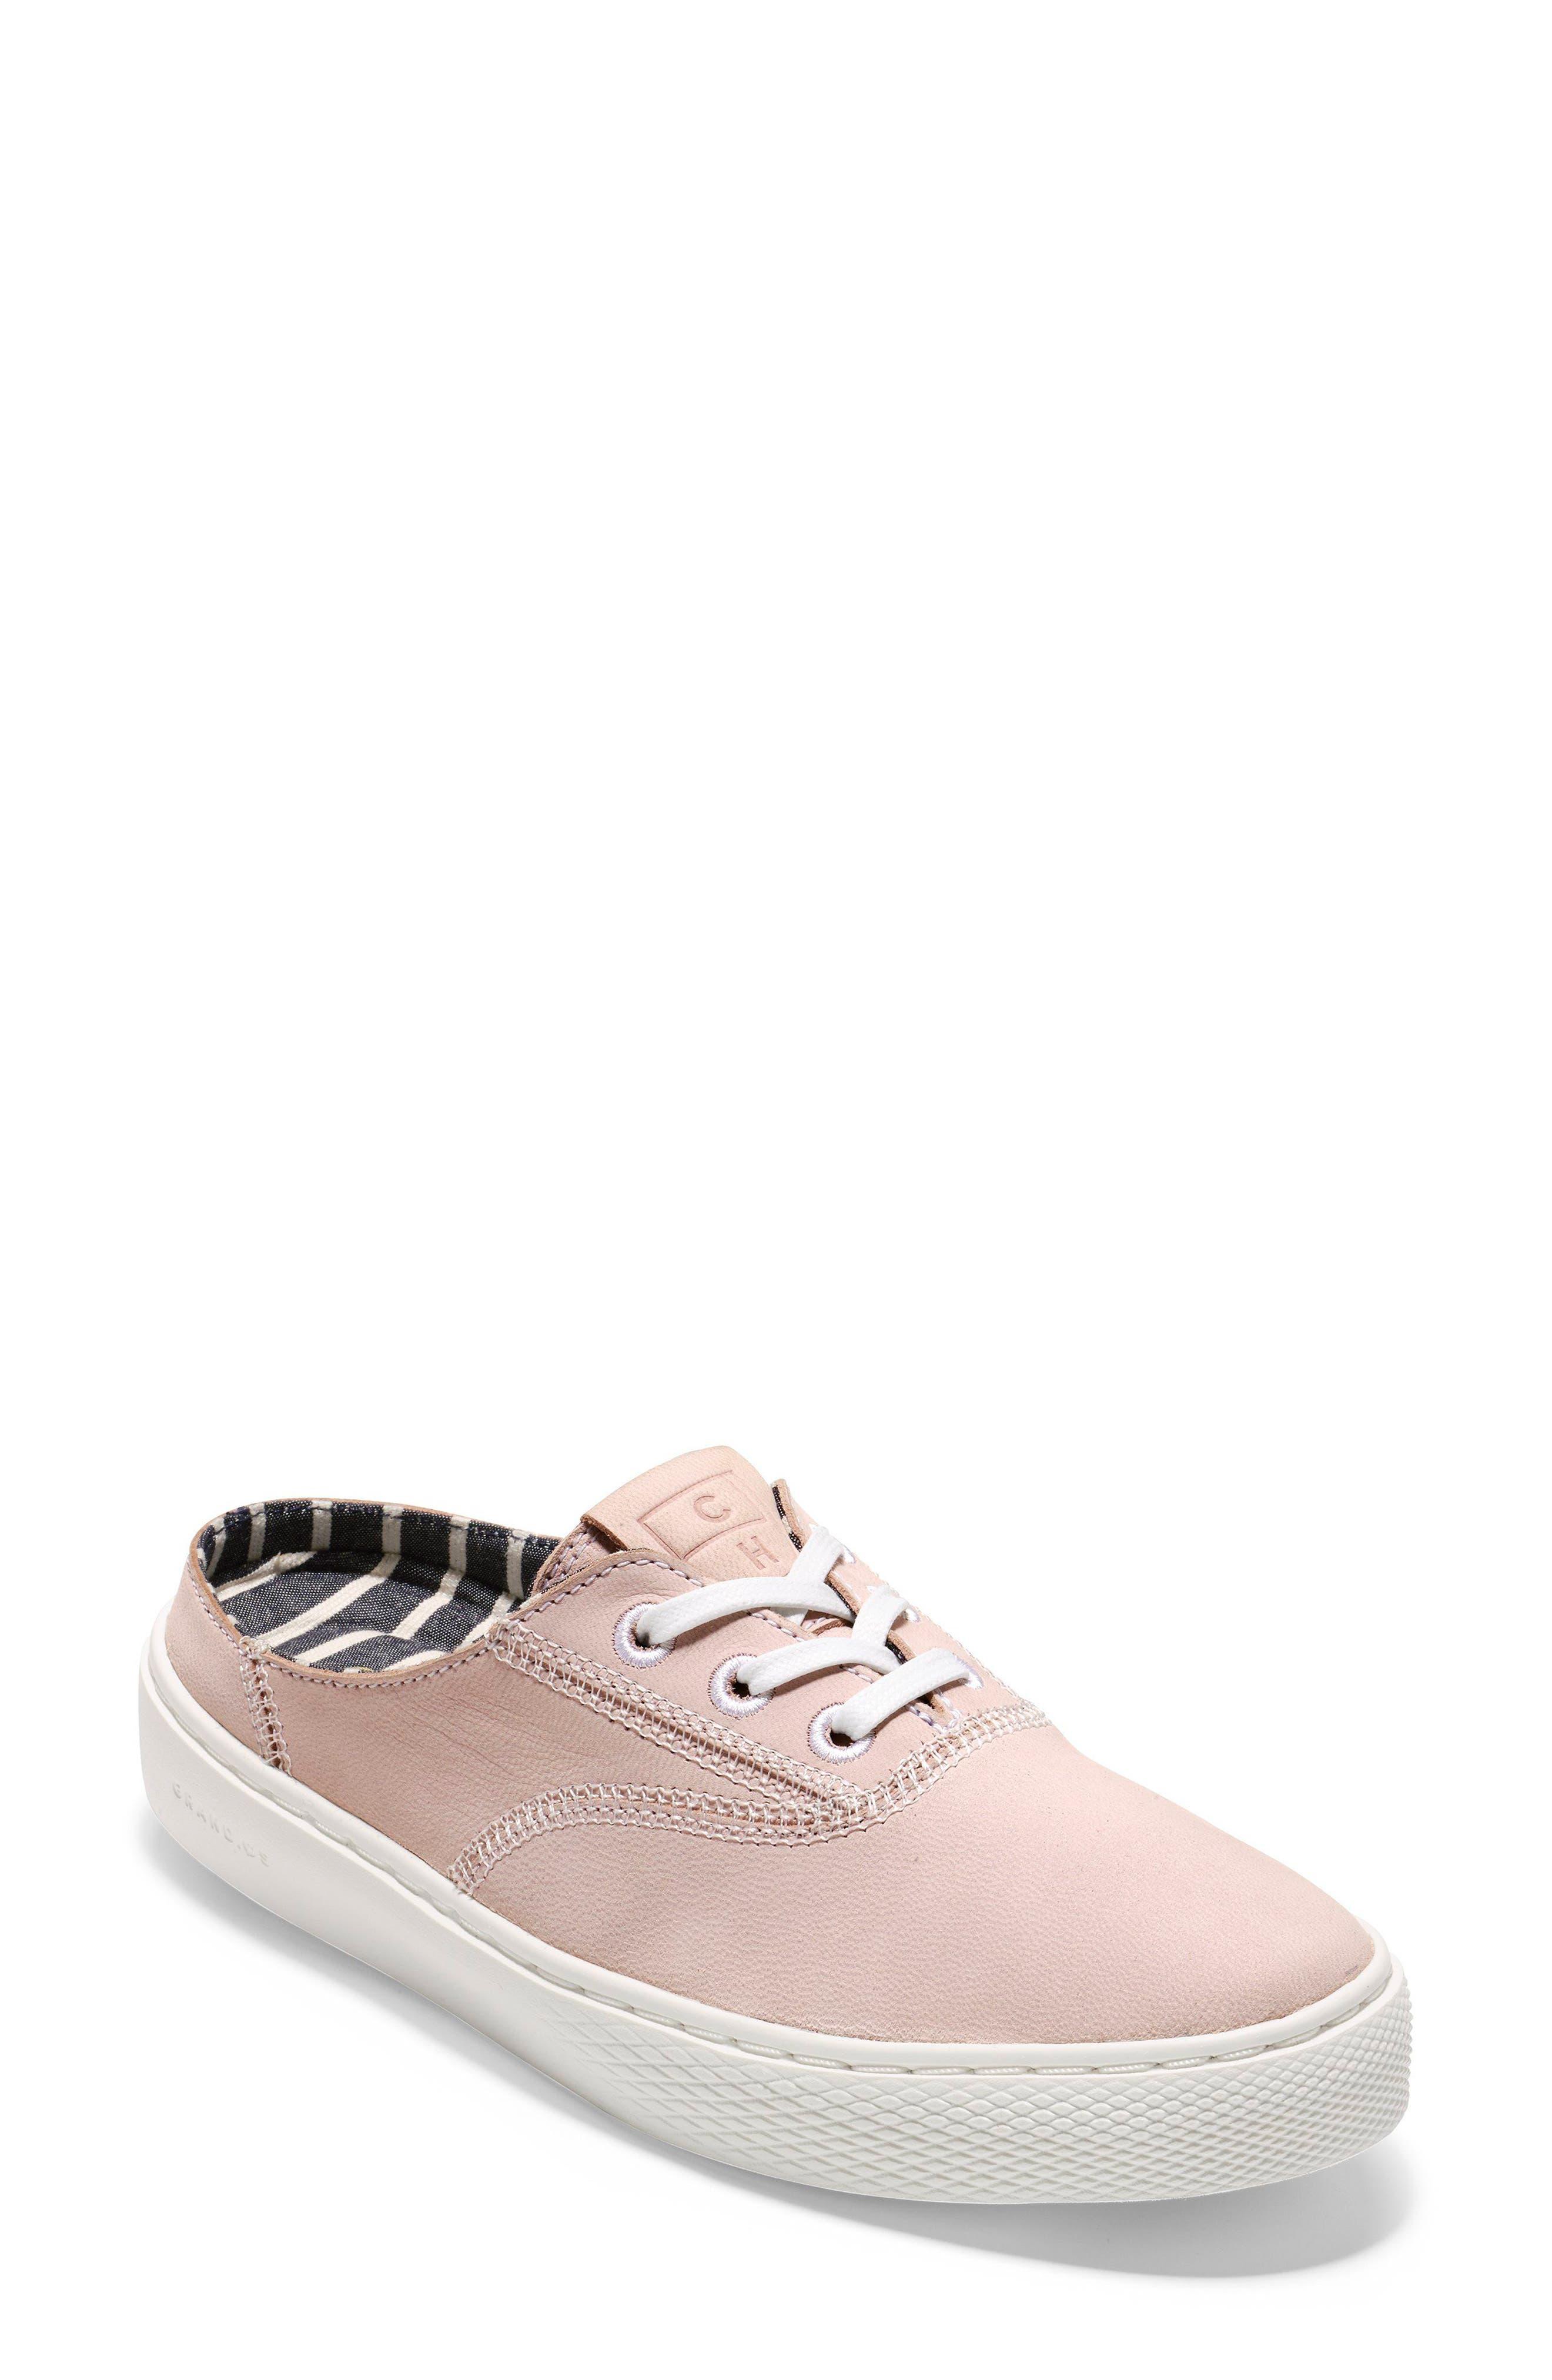 GrandPro Deck Sneaker,                             Main thumbnail 1, color,                             PETAL/ OPTIC WHITE NUBUCK